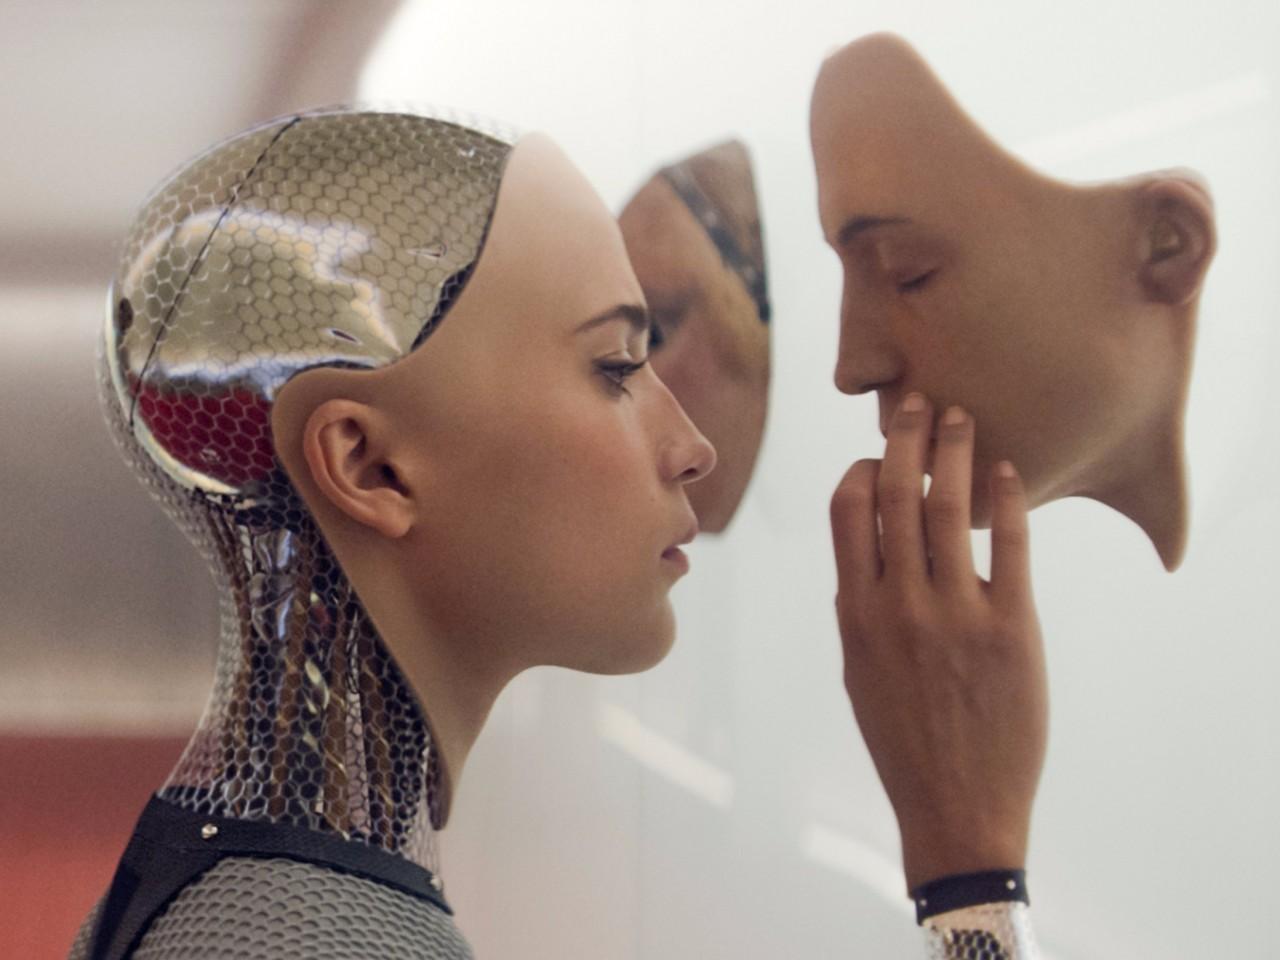 ex-machina-movie-artificial-intelligence-robot